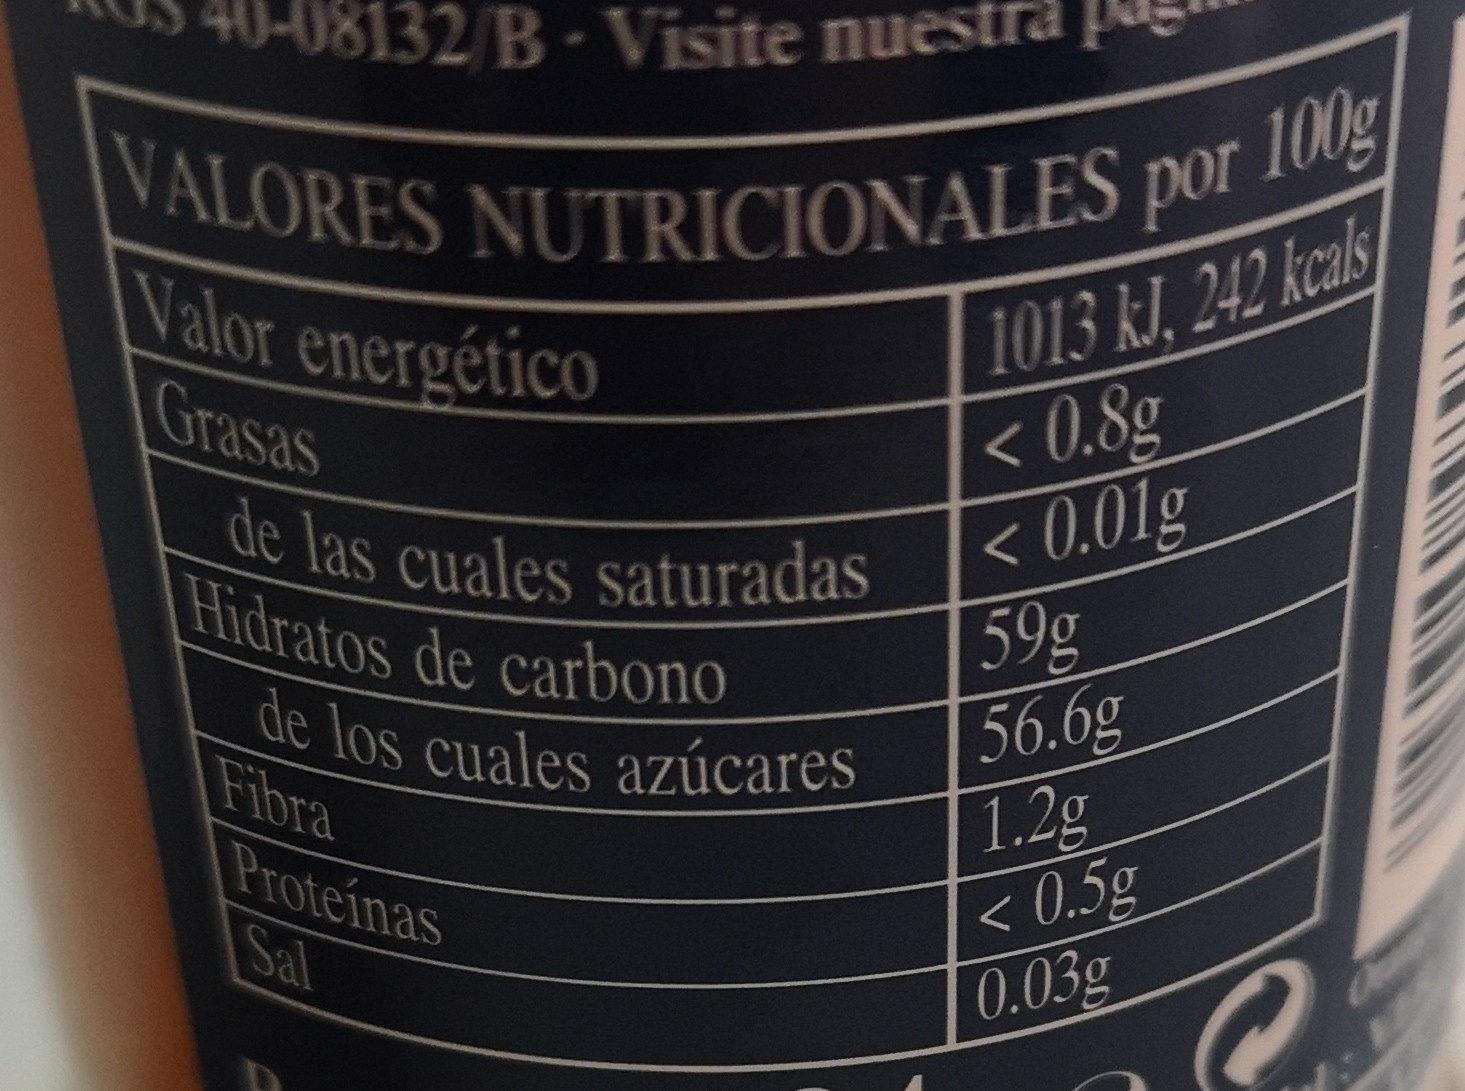 Rapsodia de frutas jengibre y naranja - Informació nutricional